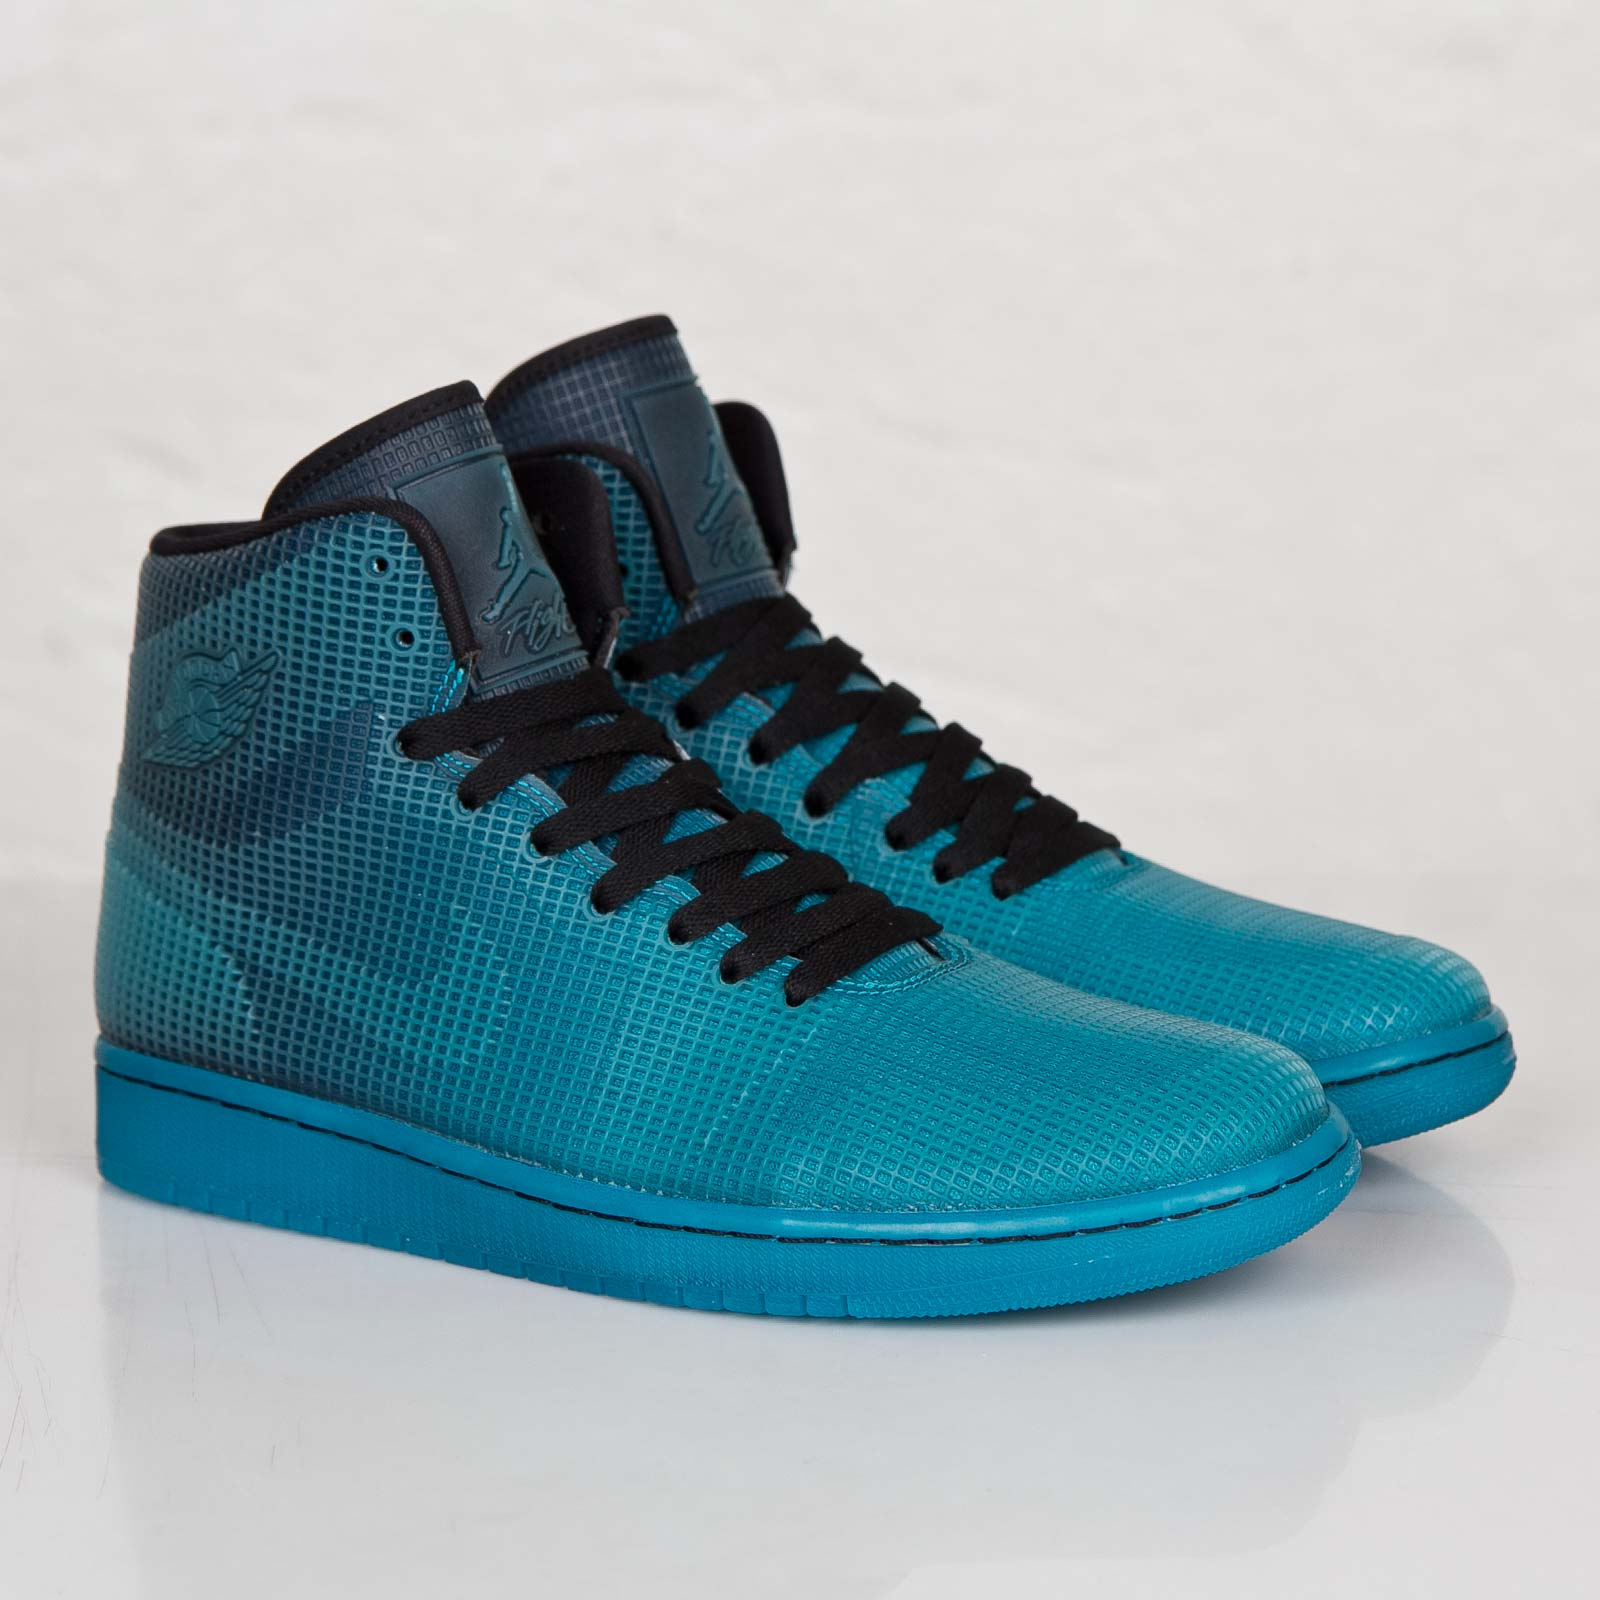 new style 19a8b 3ebfb Jordan Brand Air Jordan 4Lab1